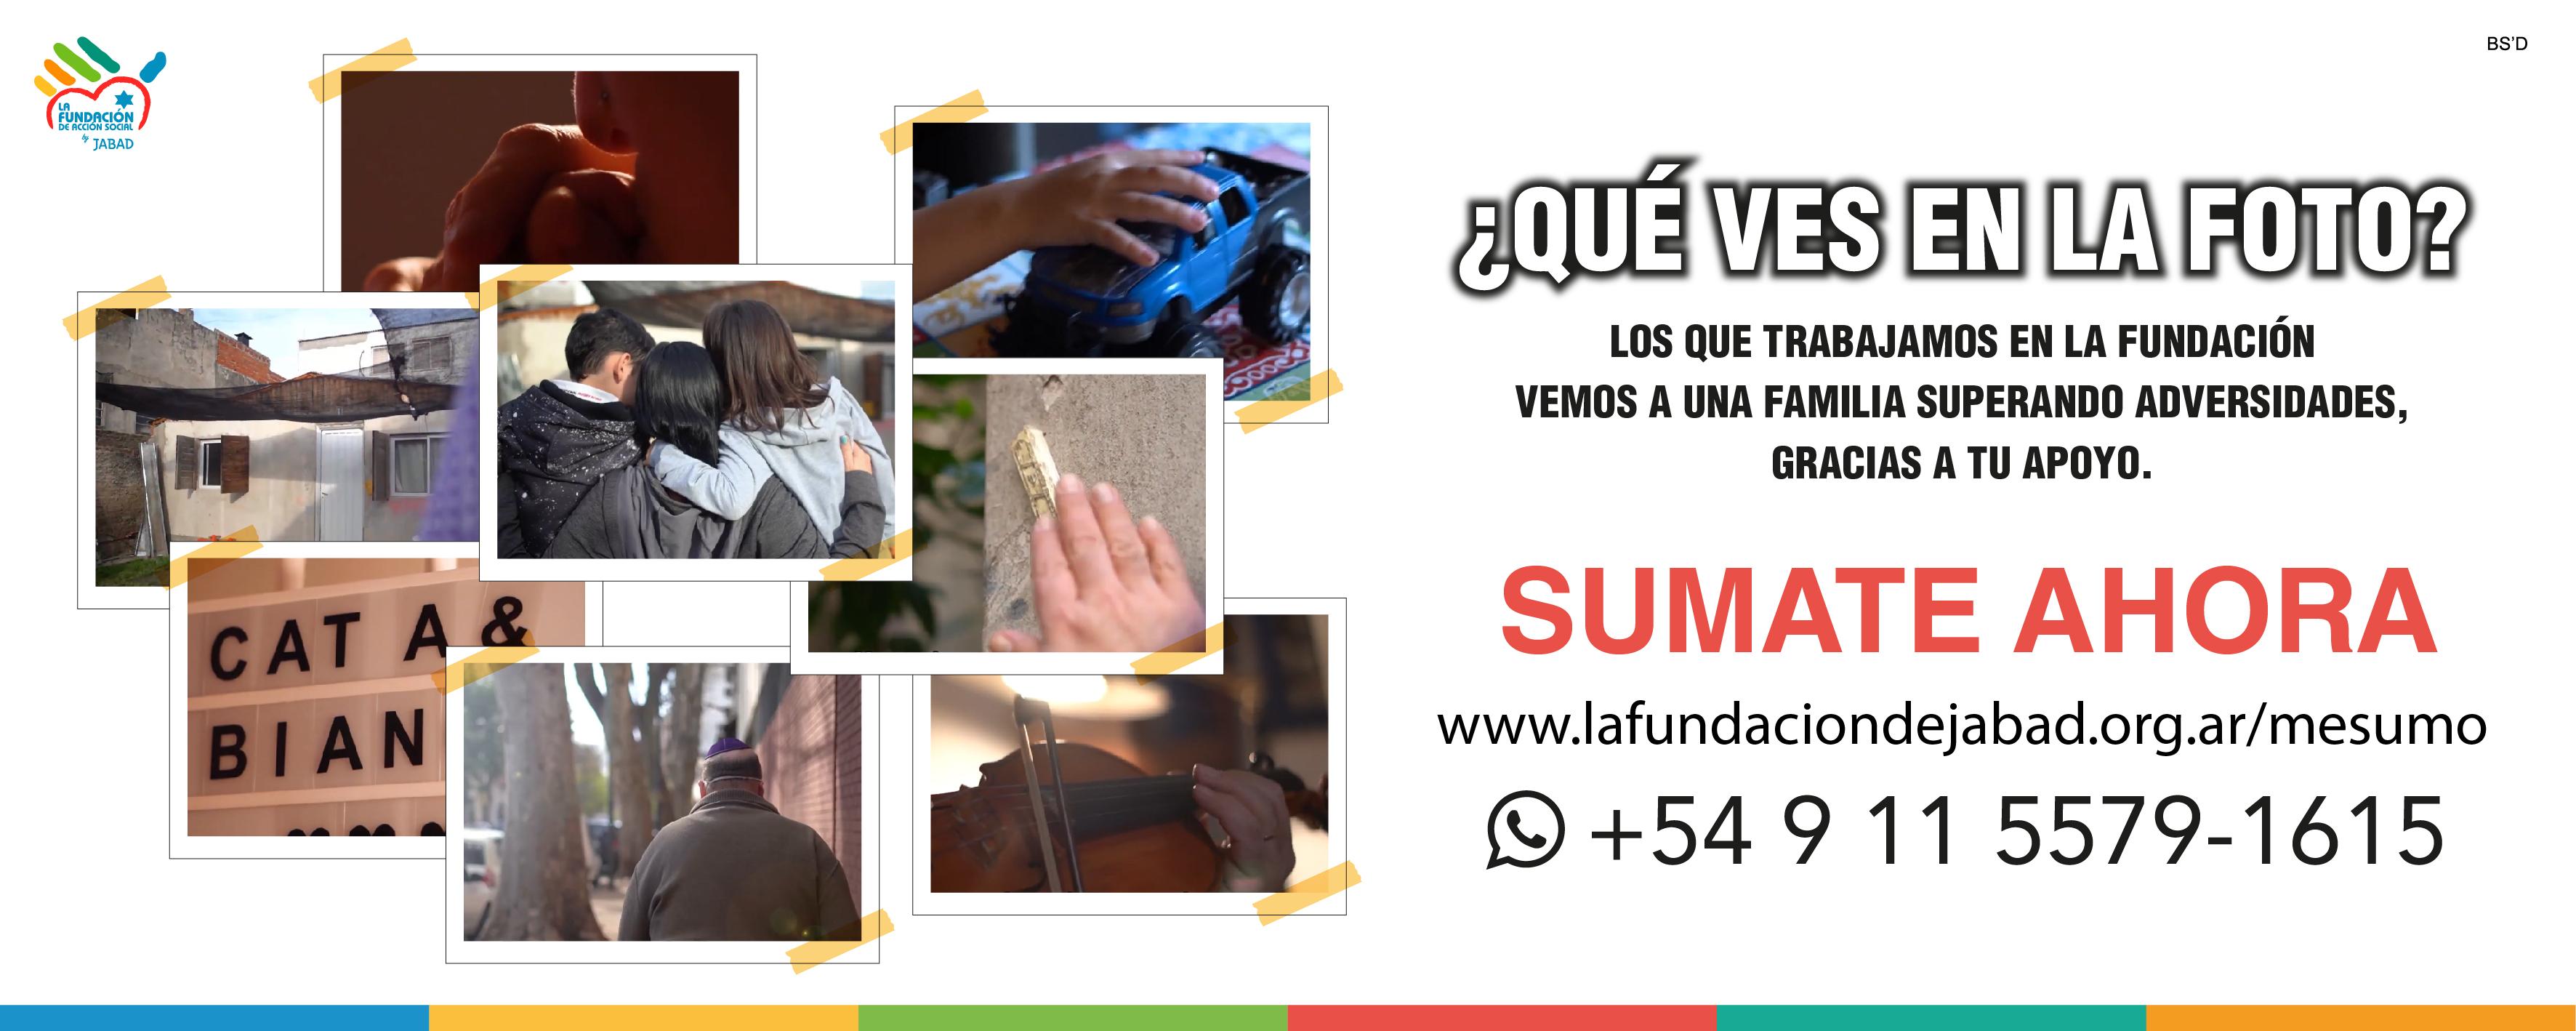 Fundacion - Campaña Socios_Banner web